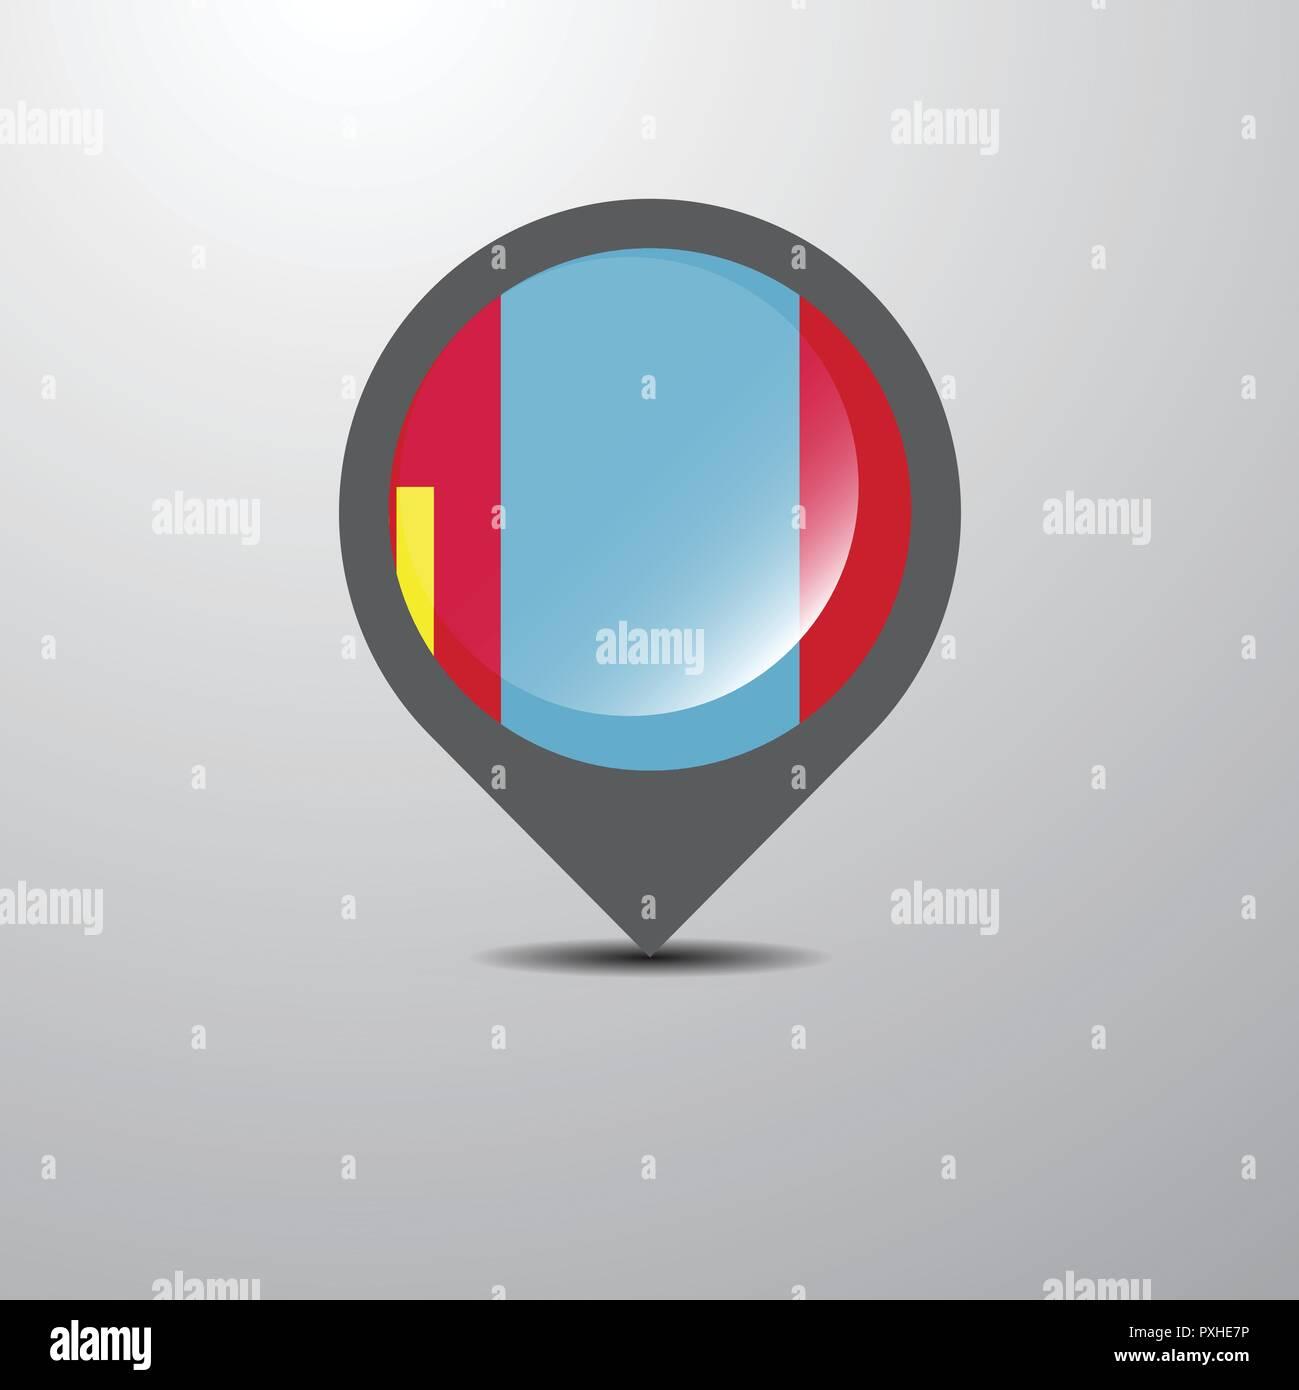 Mongolia Map Pin - Stock Image